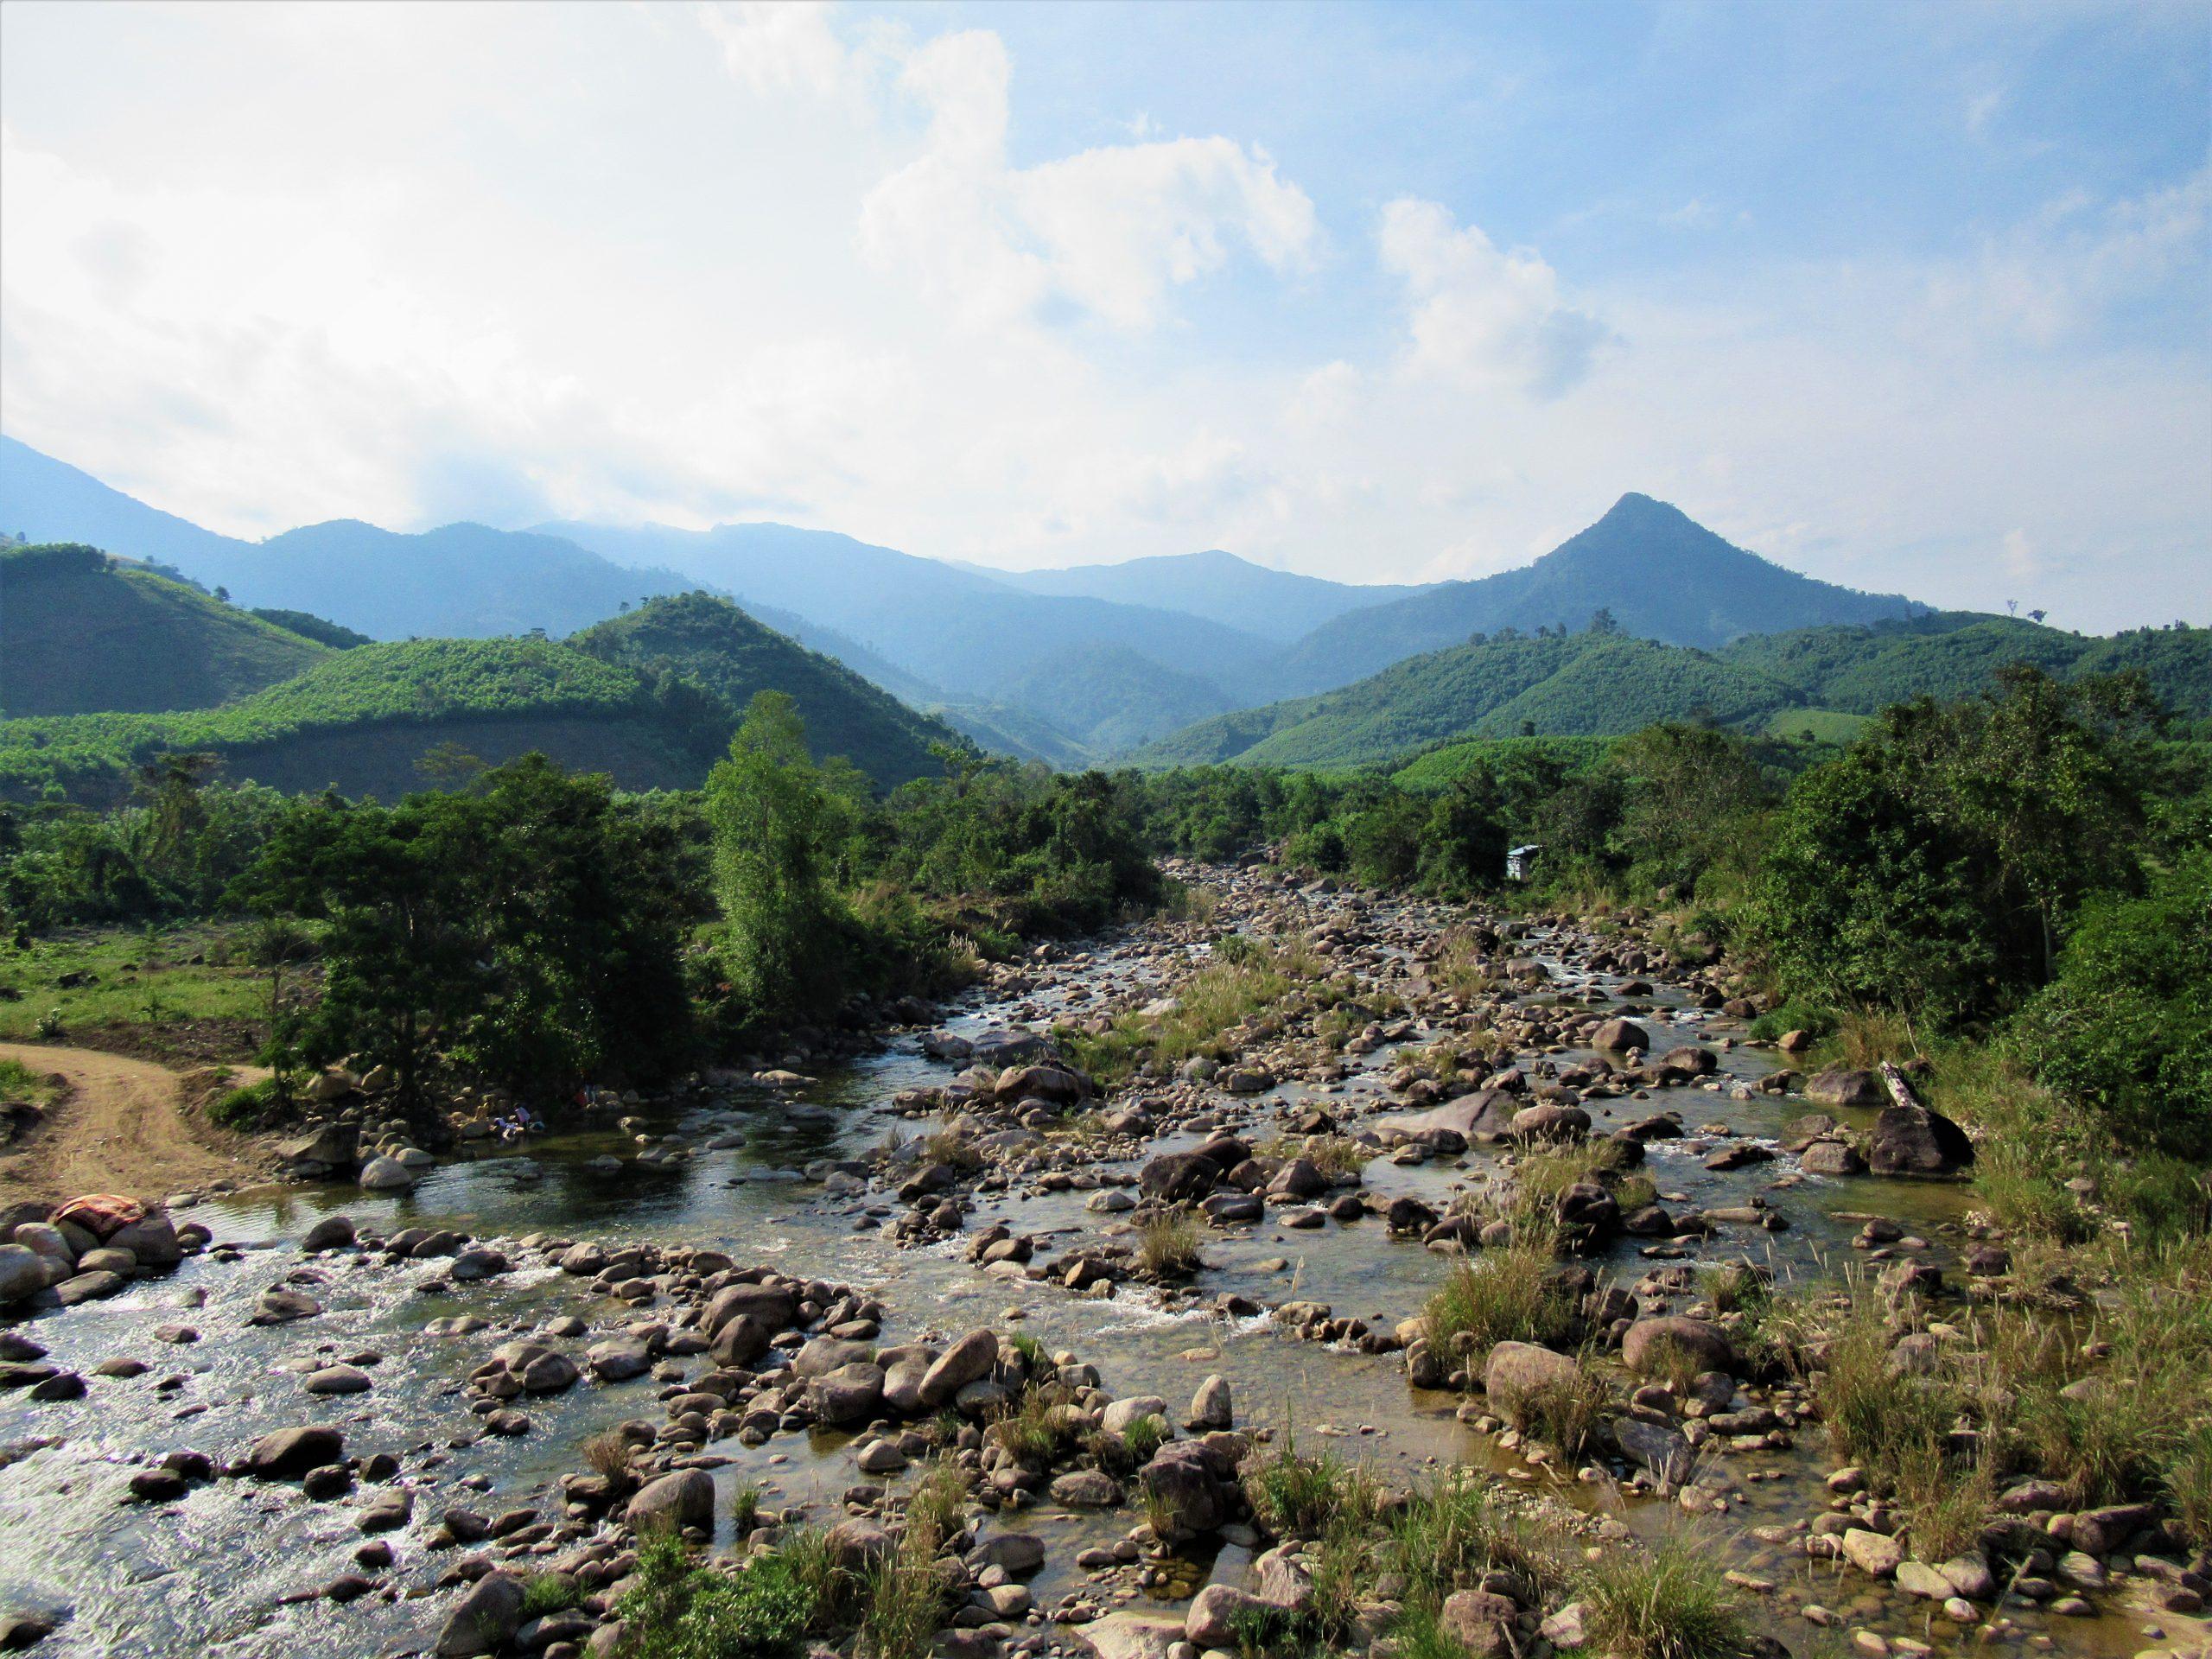 Camping along Khanh Vinh tributaries, Khanh Hoa Province, Vietnam